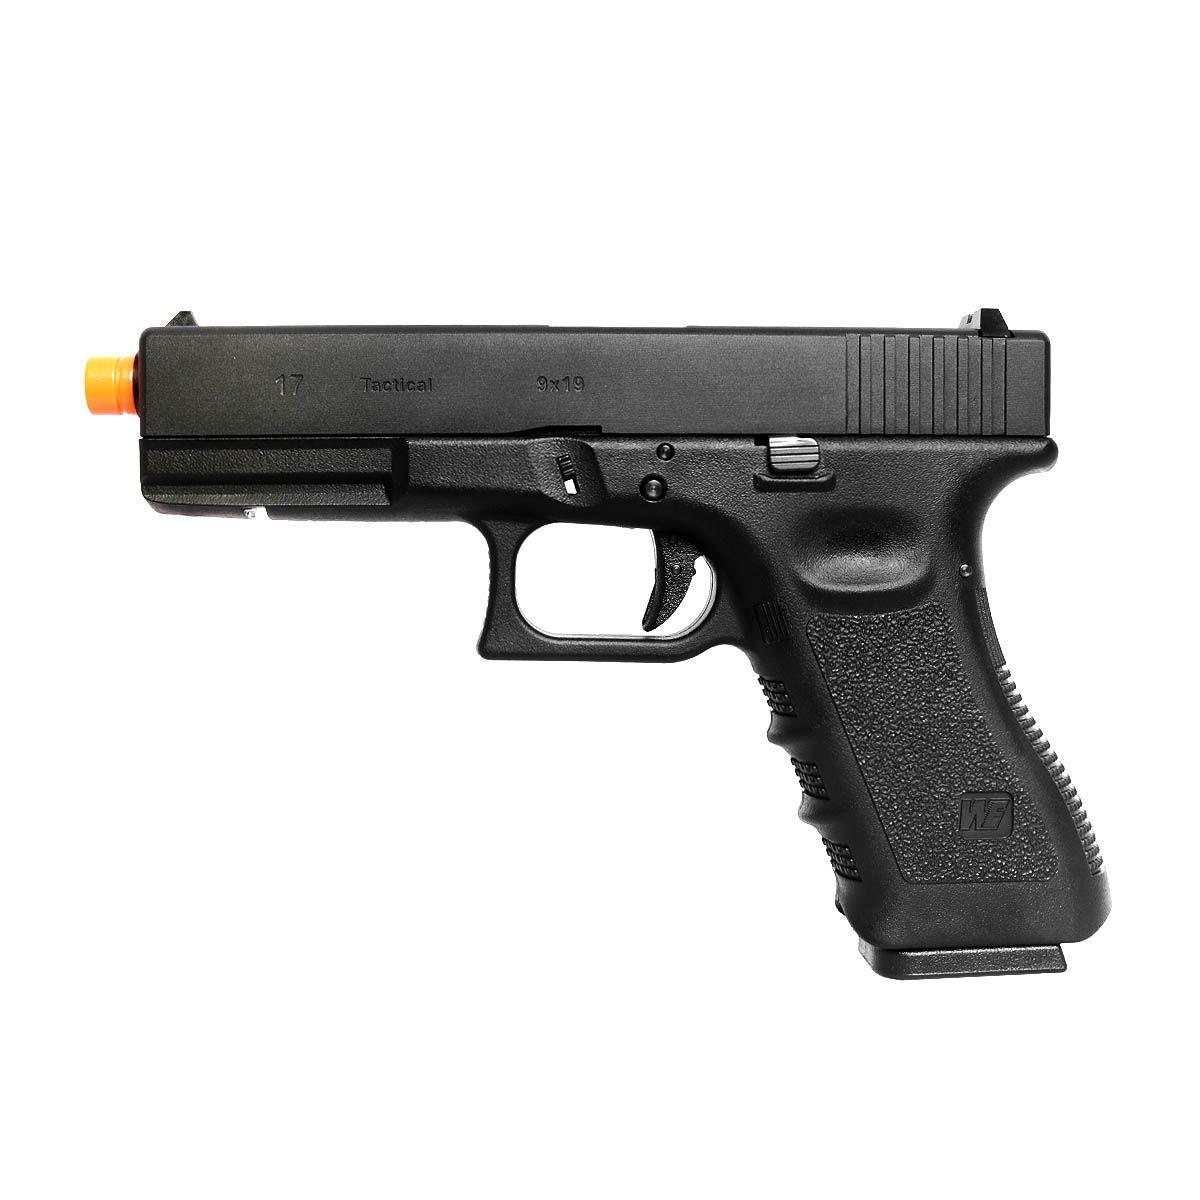 Pistola Airsoft WE Glock G19 Gen4 Mesmo Tamanho G25